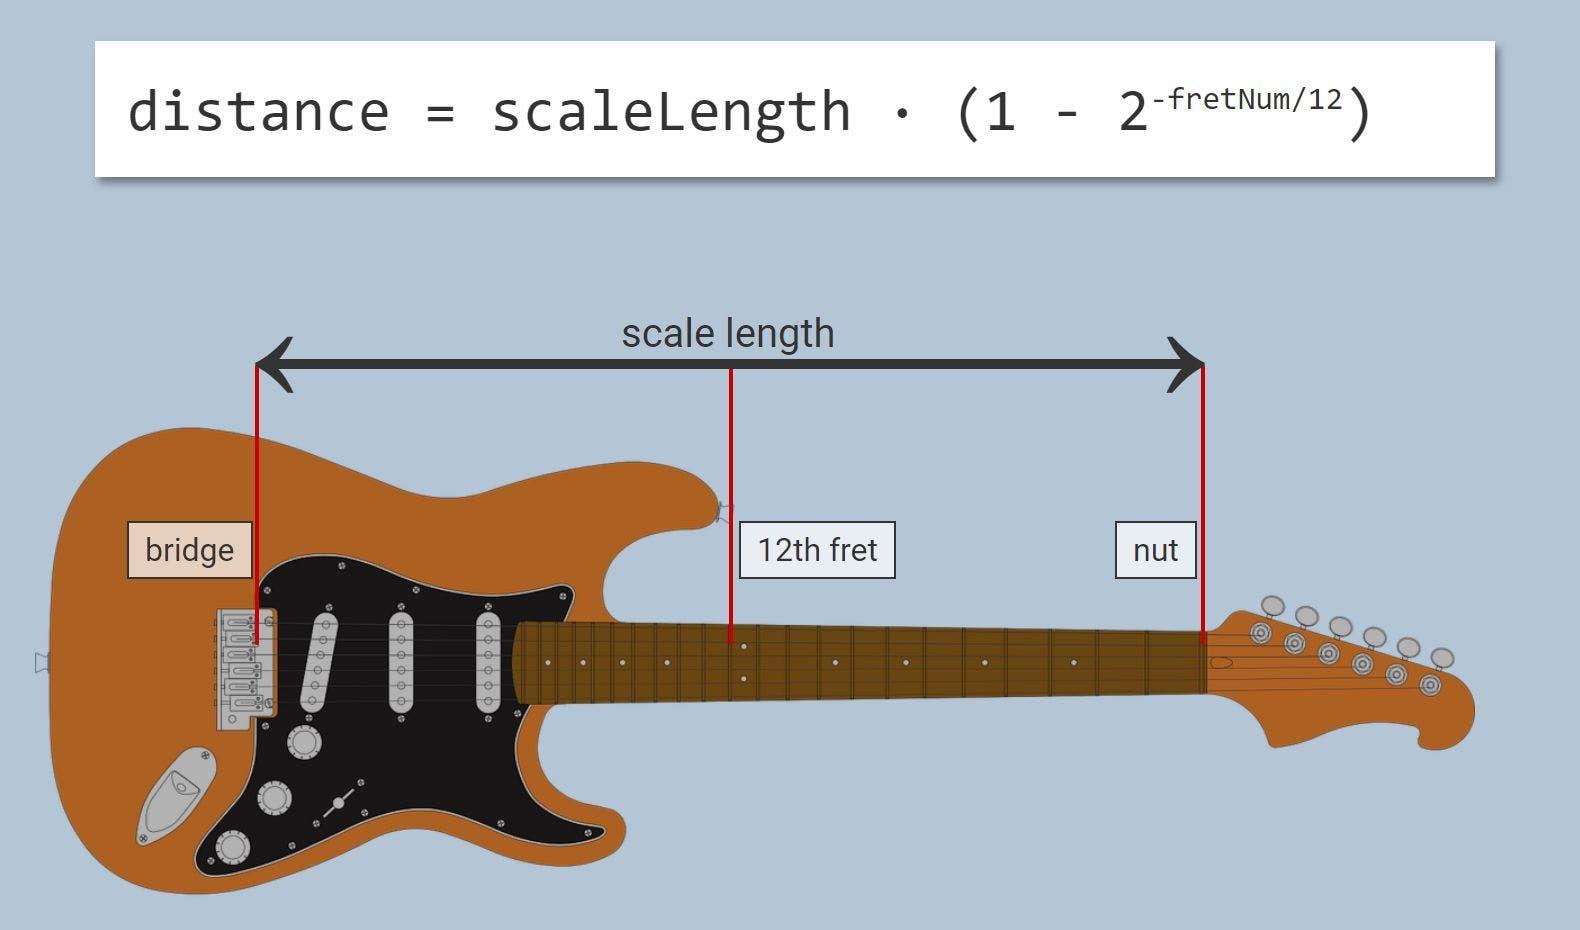 guitar-scale-length-formula.jpg